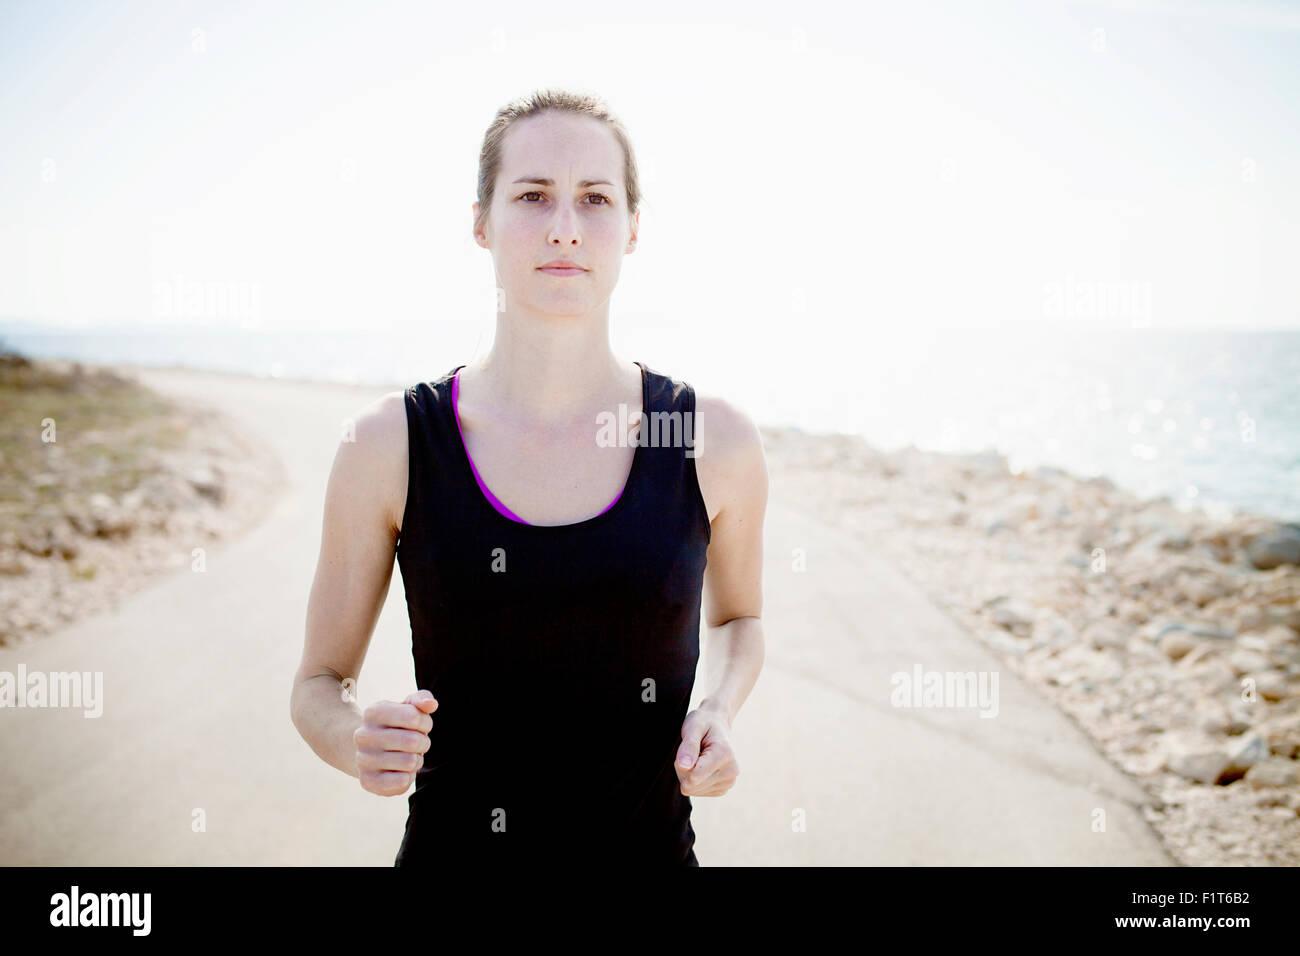 Mujer en ropa deportiva trotar en el waterfront ruta Imagen De Stock